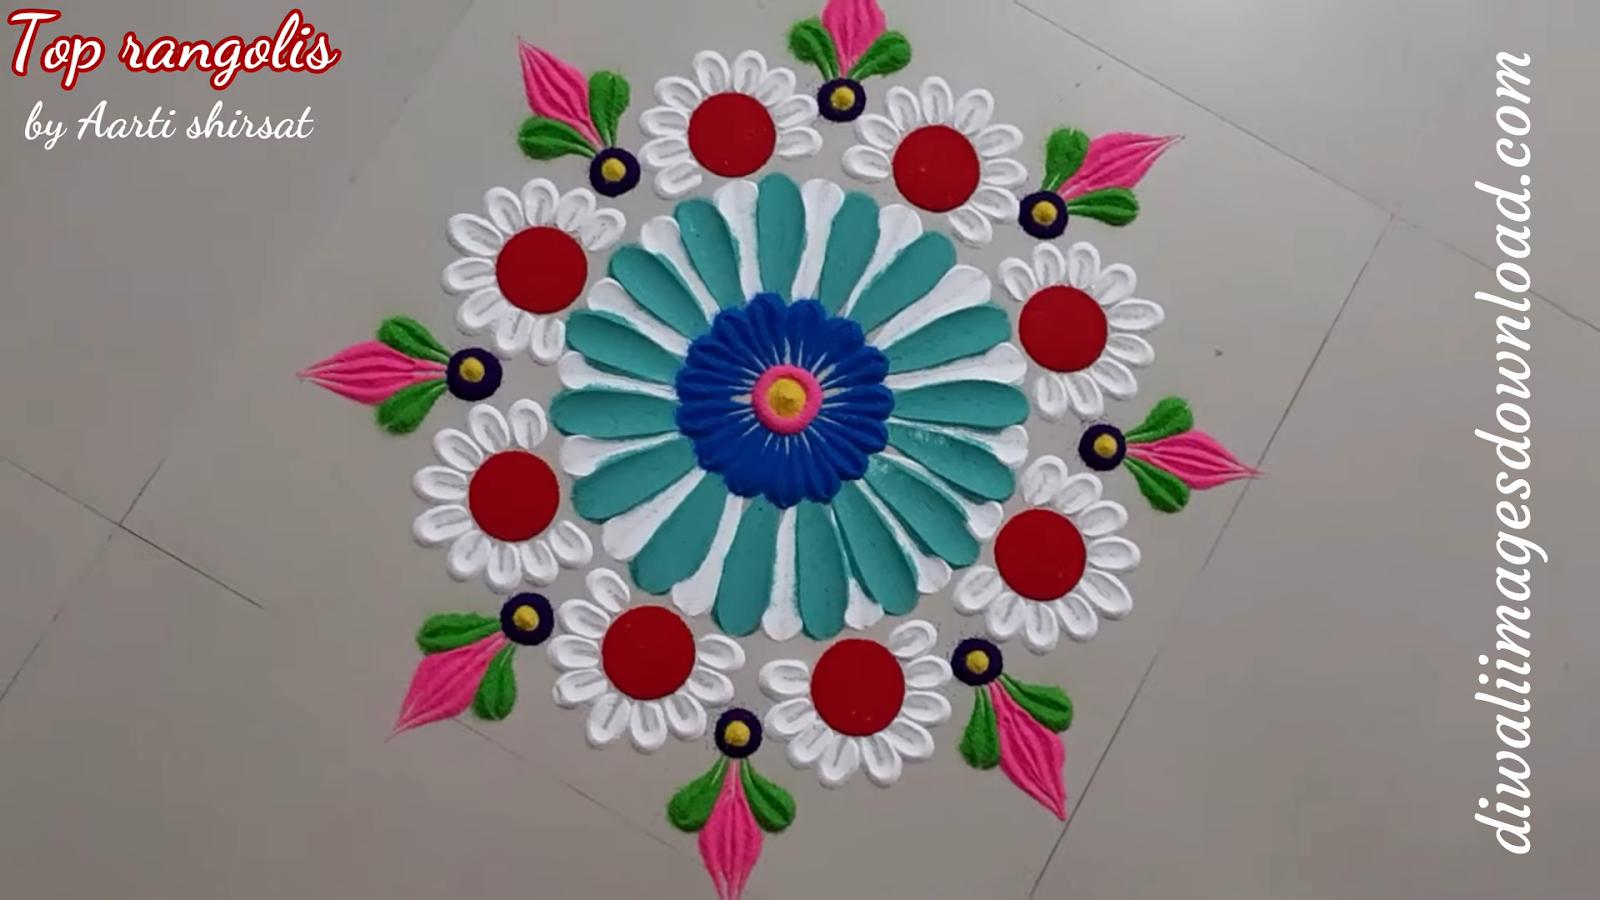 Rangoli Designs 2019